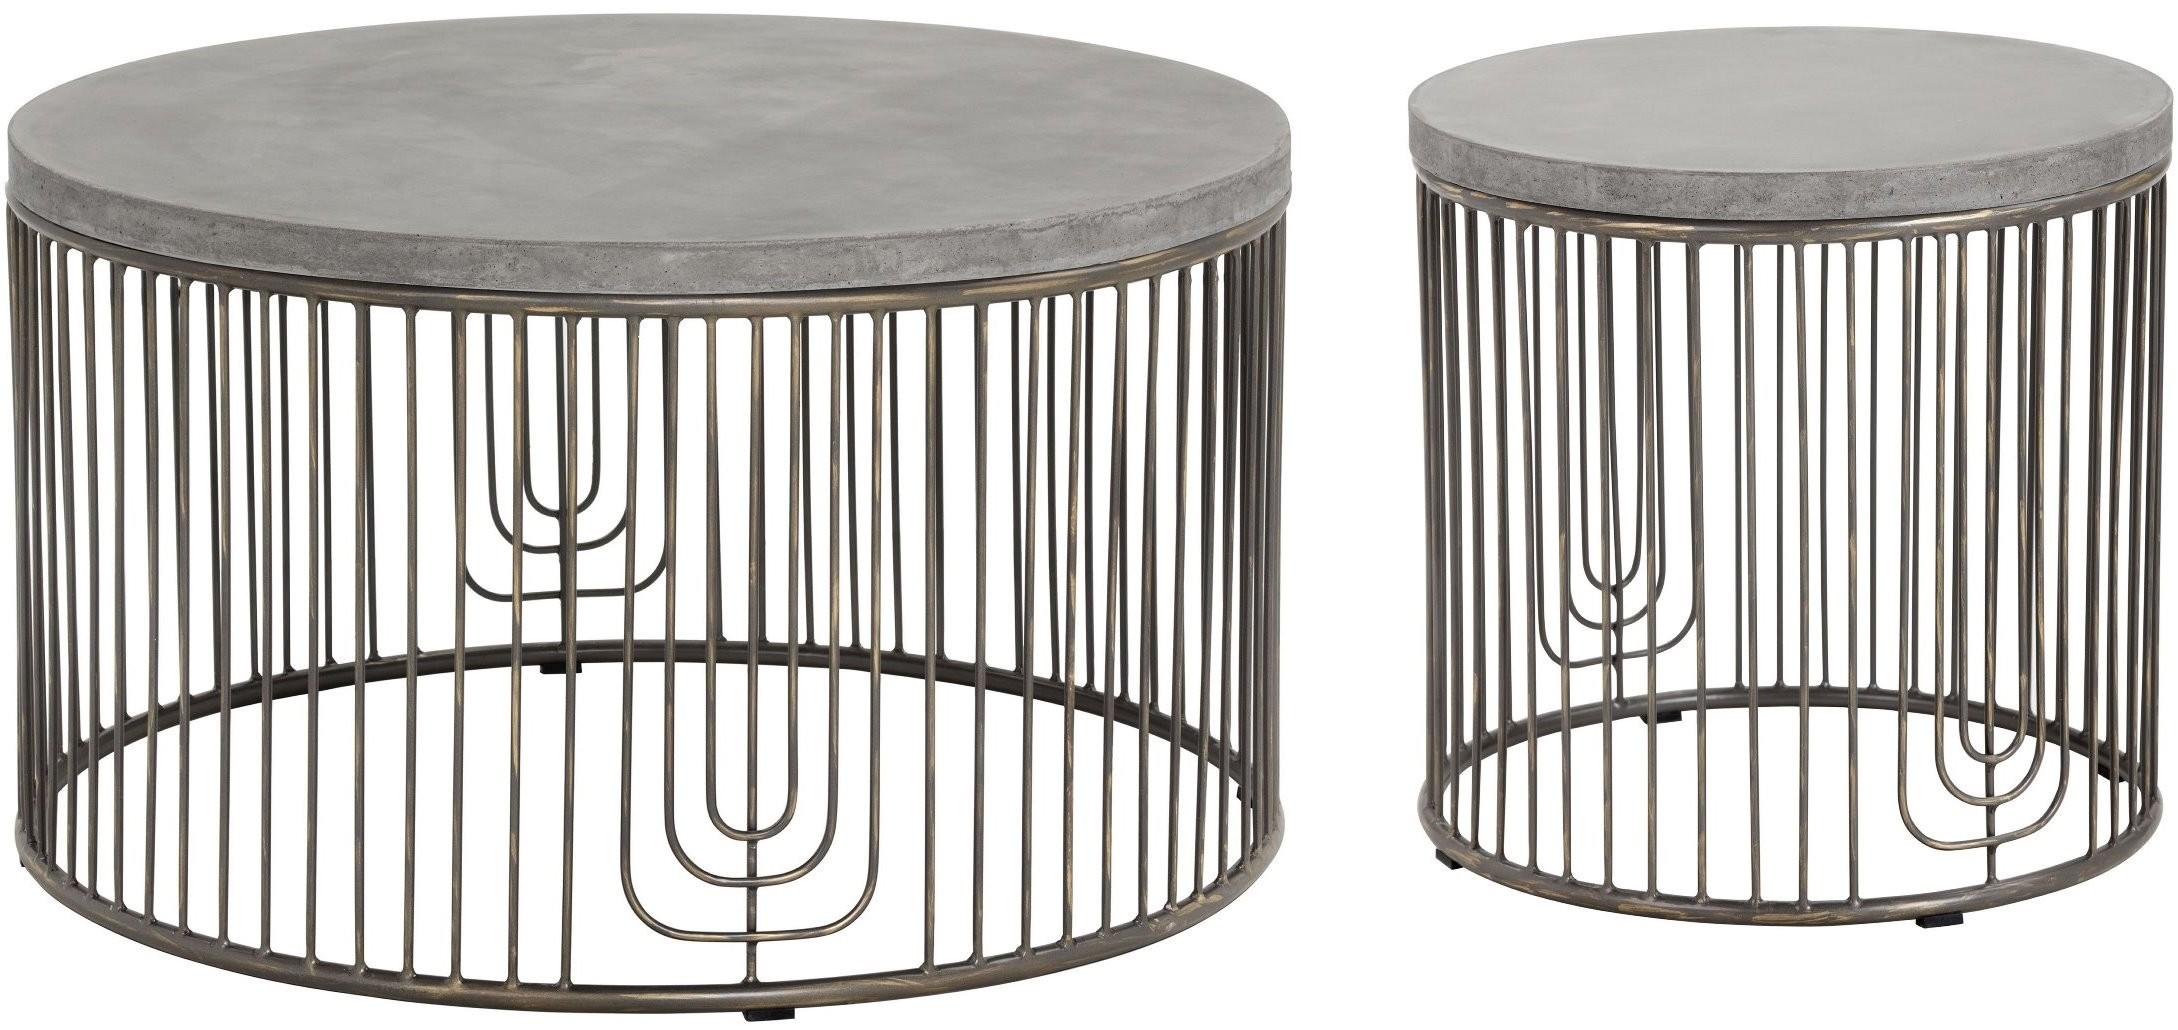 Sargon grey concrete coffee table from sunpan coleman furniture sargon grey concrete coffee table sunpan modern home 1731055 1731056 1731057 geotapseo Gallery